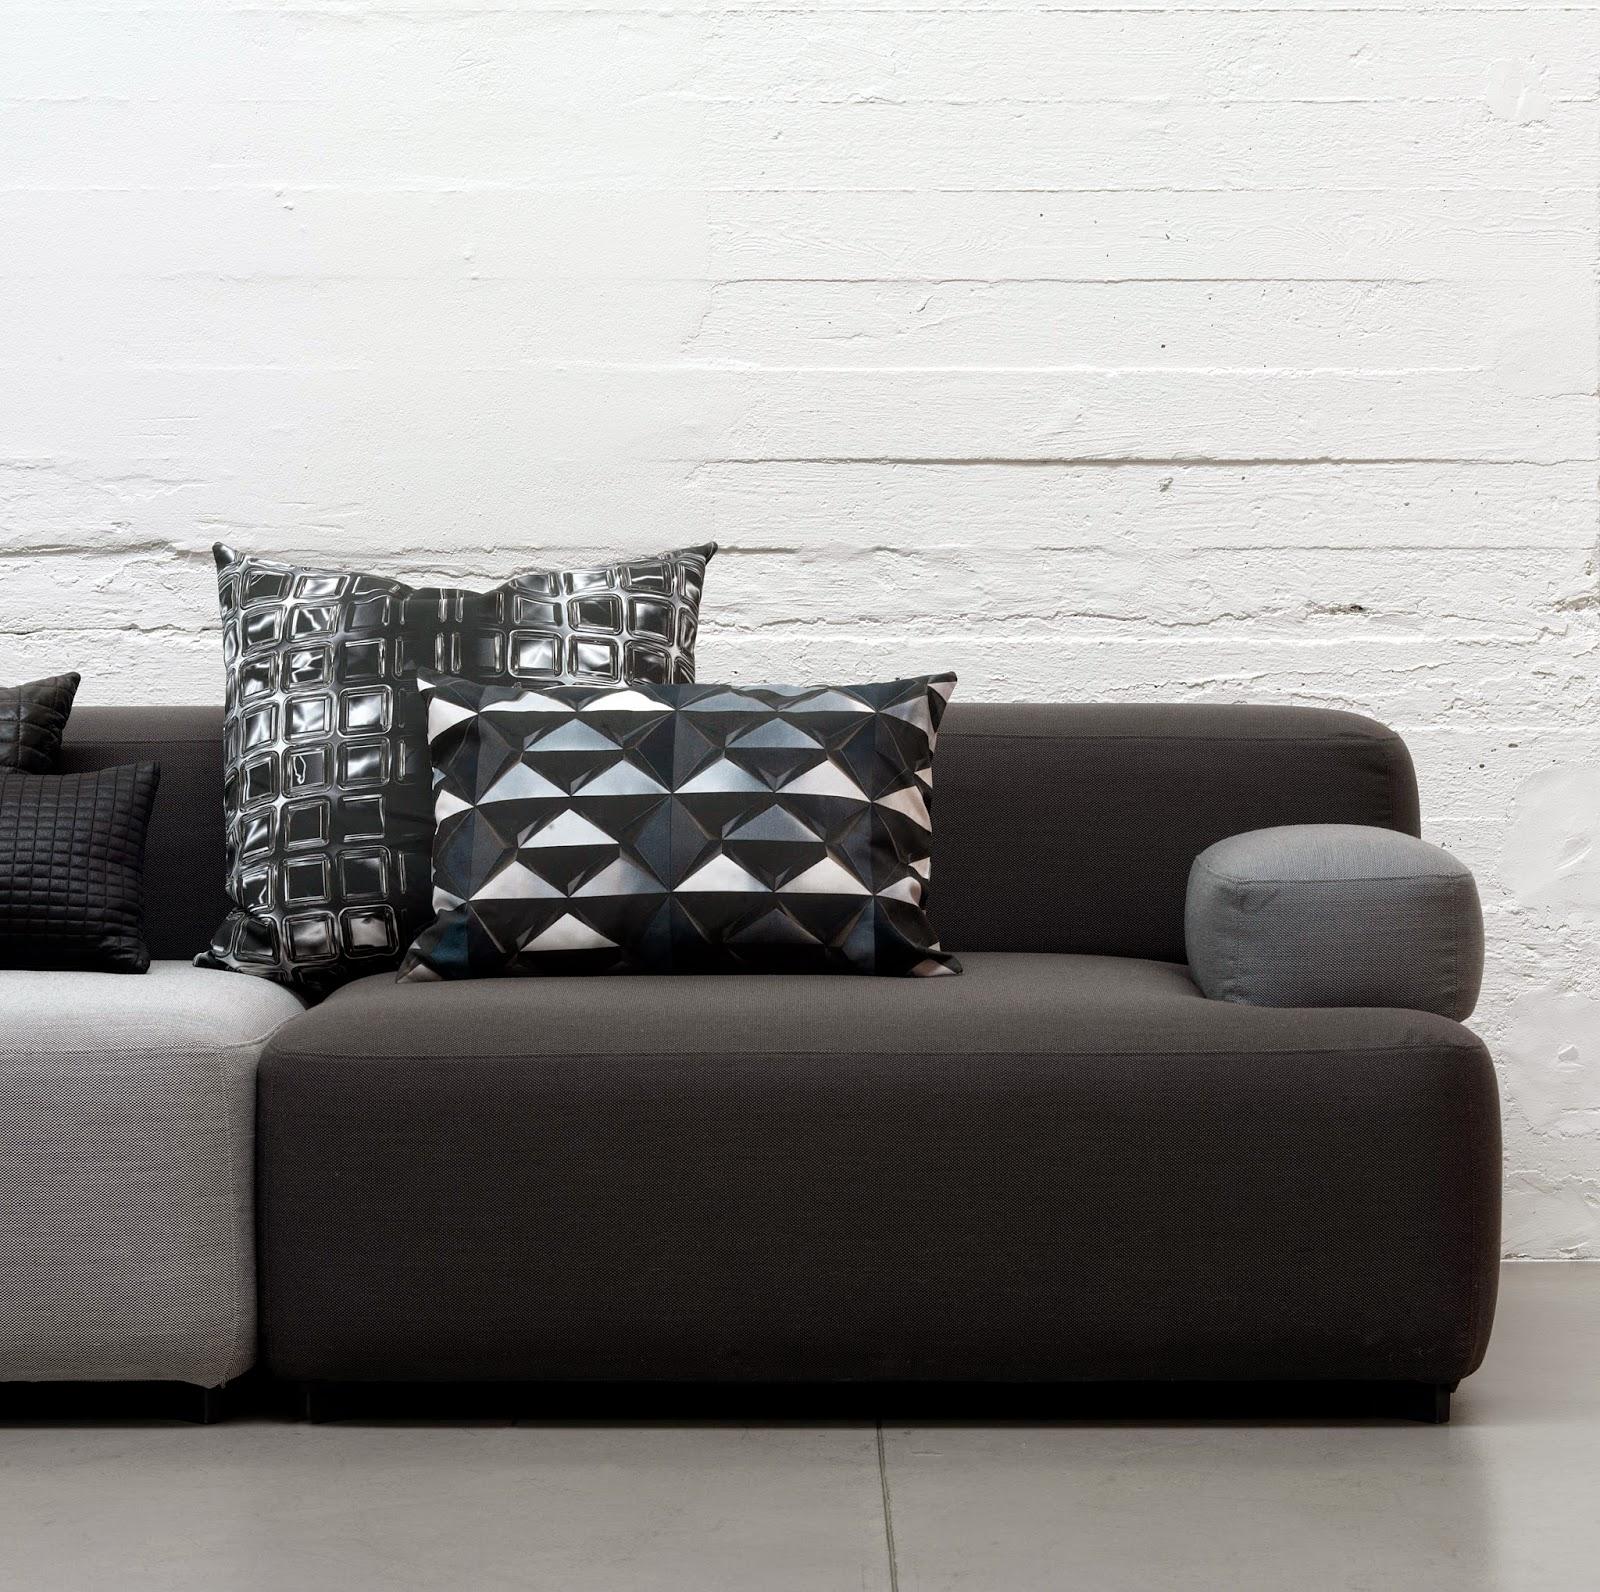 Byelisabethnl Interior Design By Louise Roe Copenhagen 02,Easy Gel Nail Designs Step By Step